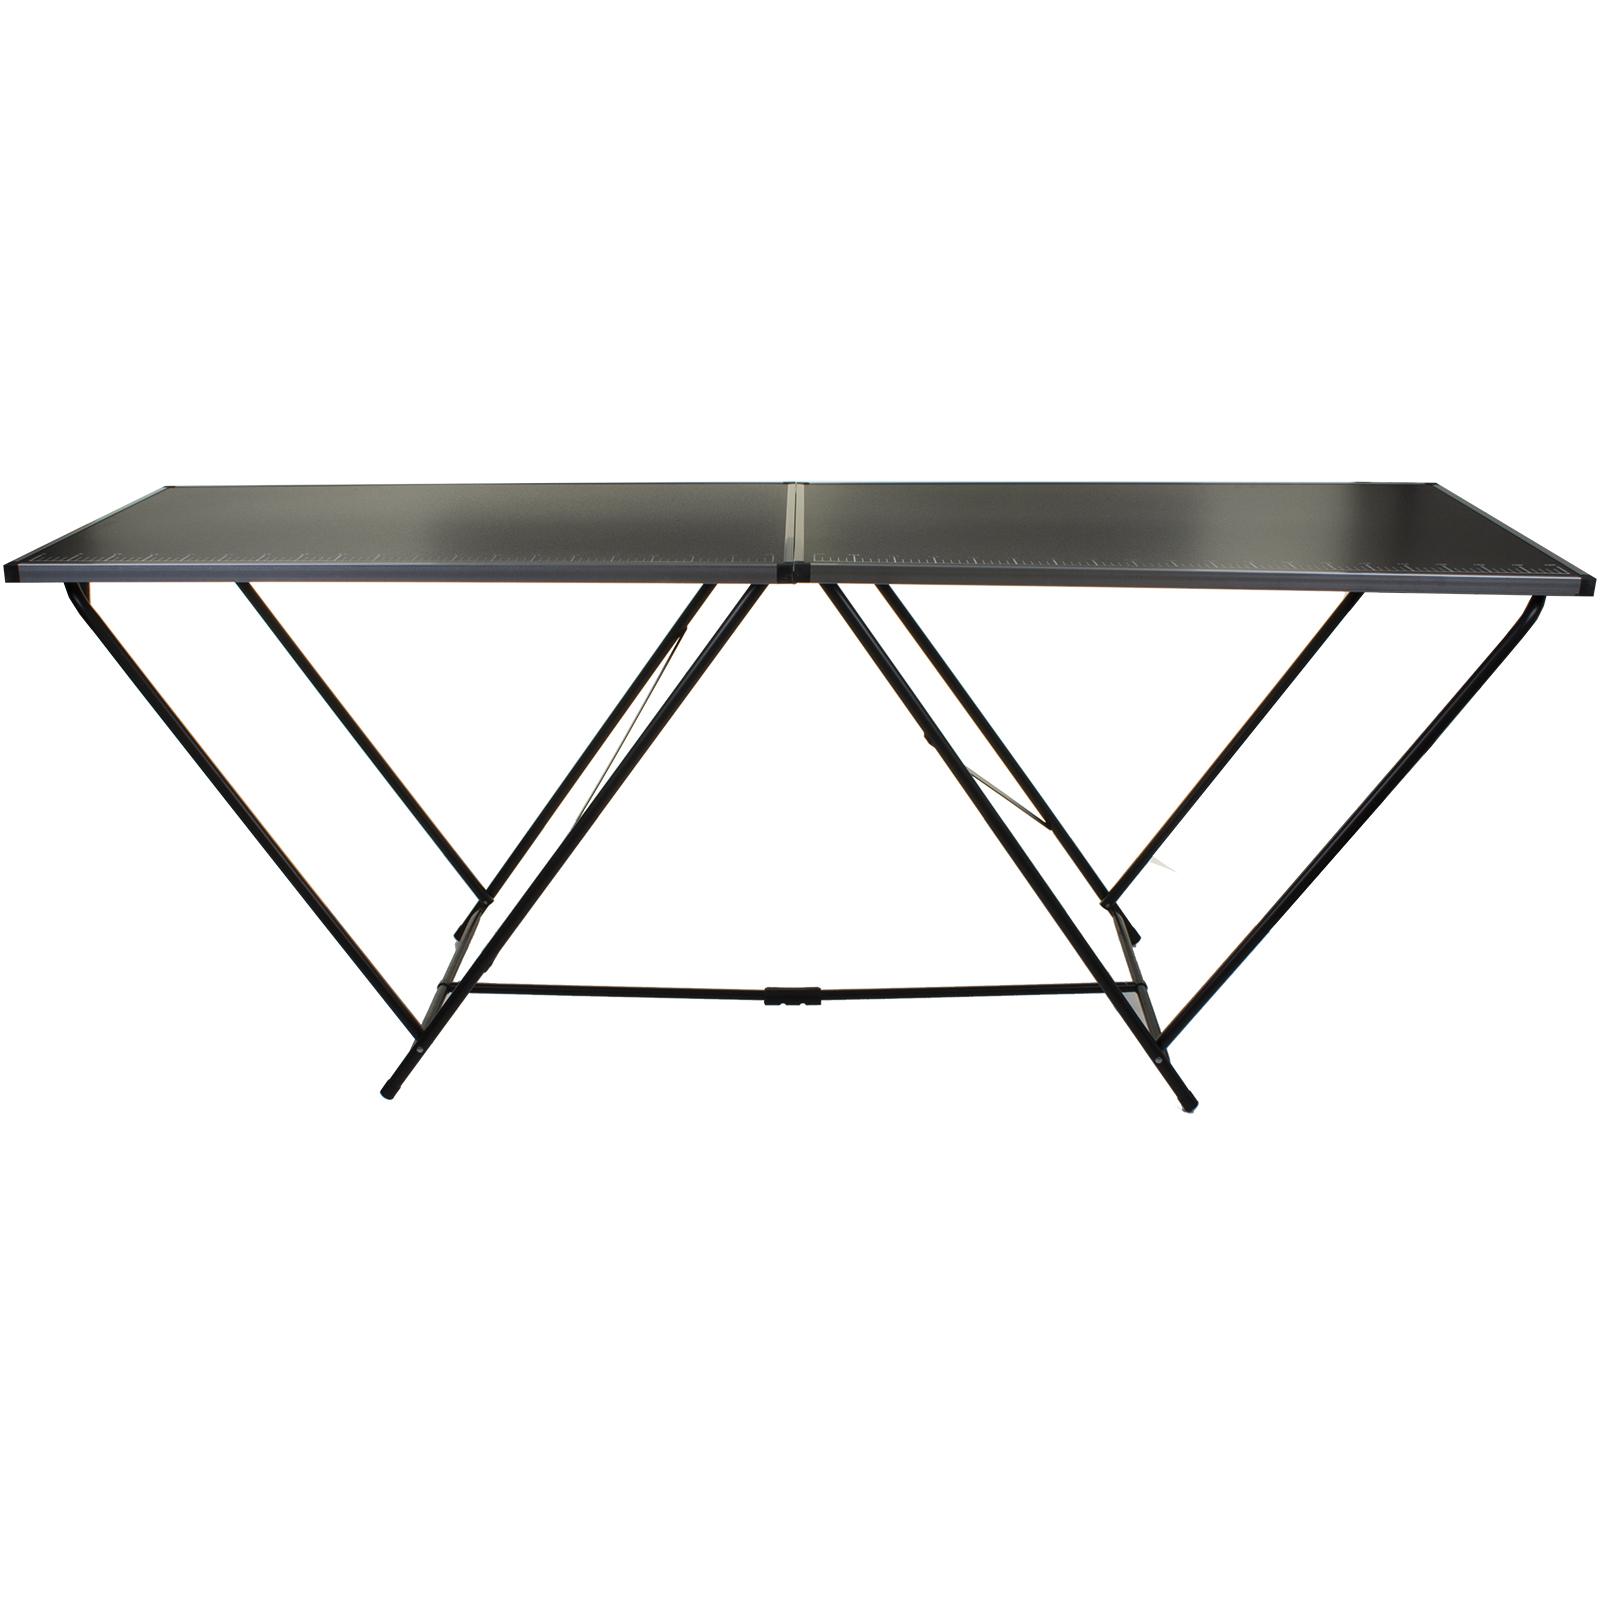 2m Wallpaper Pasting Table Folding Easy Carry Black Aluminium Diy Decorating New 5055493858176 Ebay